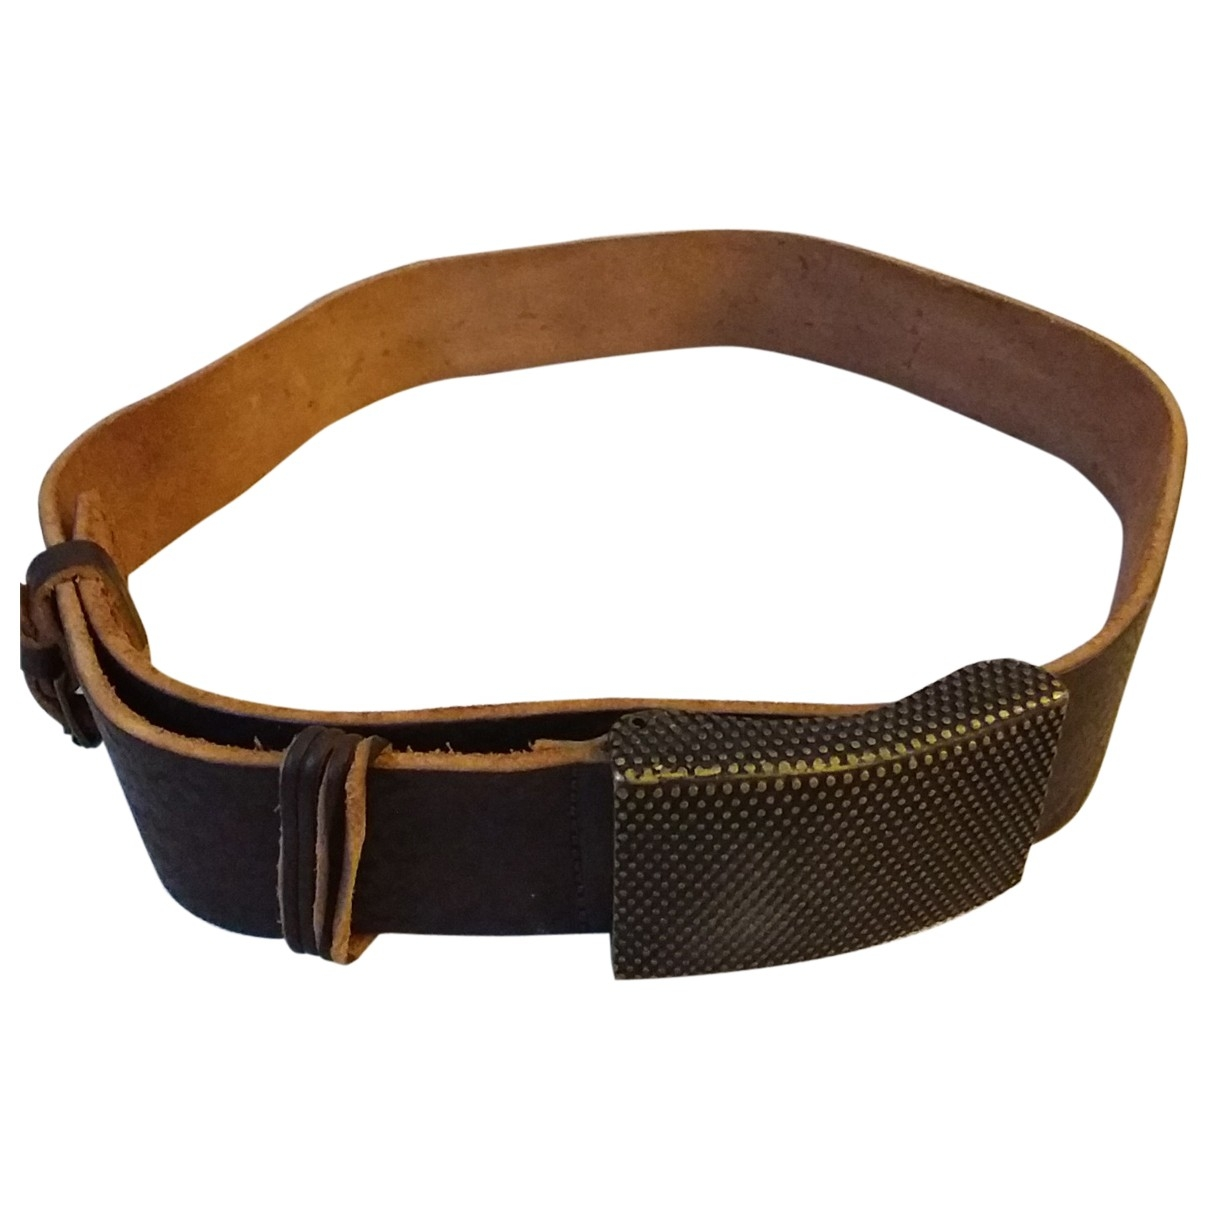 Ikks \N Brown Leather belt for Men 90 cm